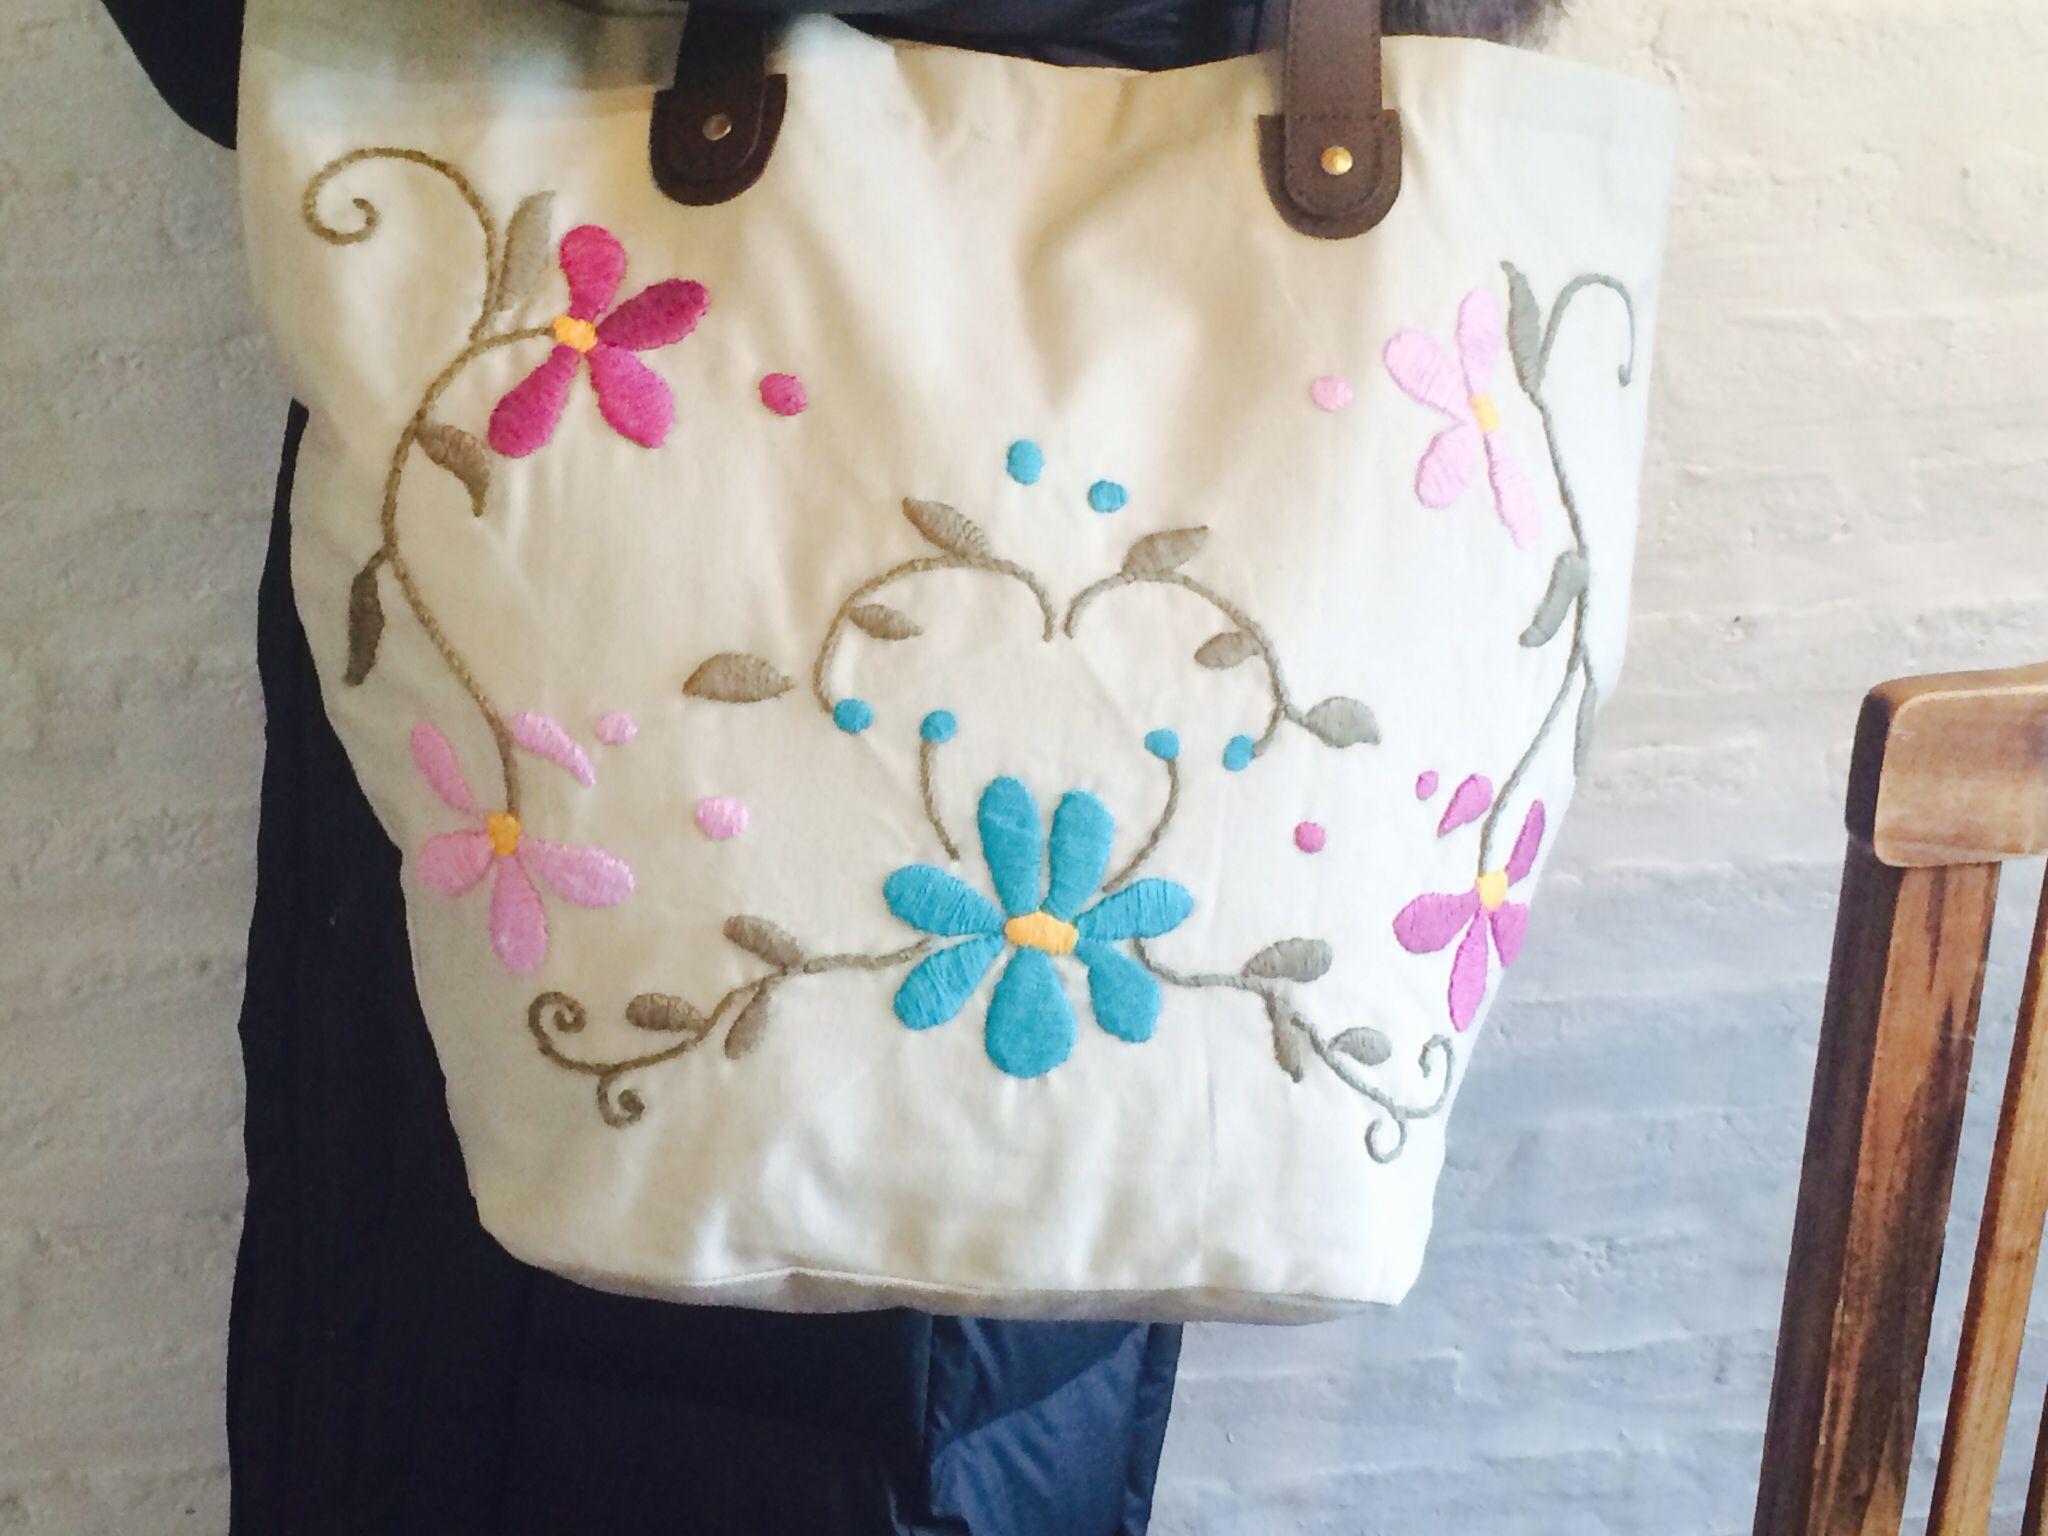 Bolso bordado   mexicano   Pinterest   Embroidery y Hand embroidery